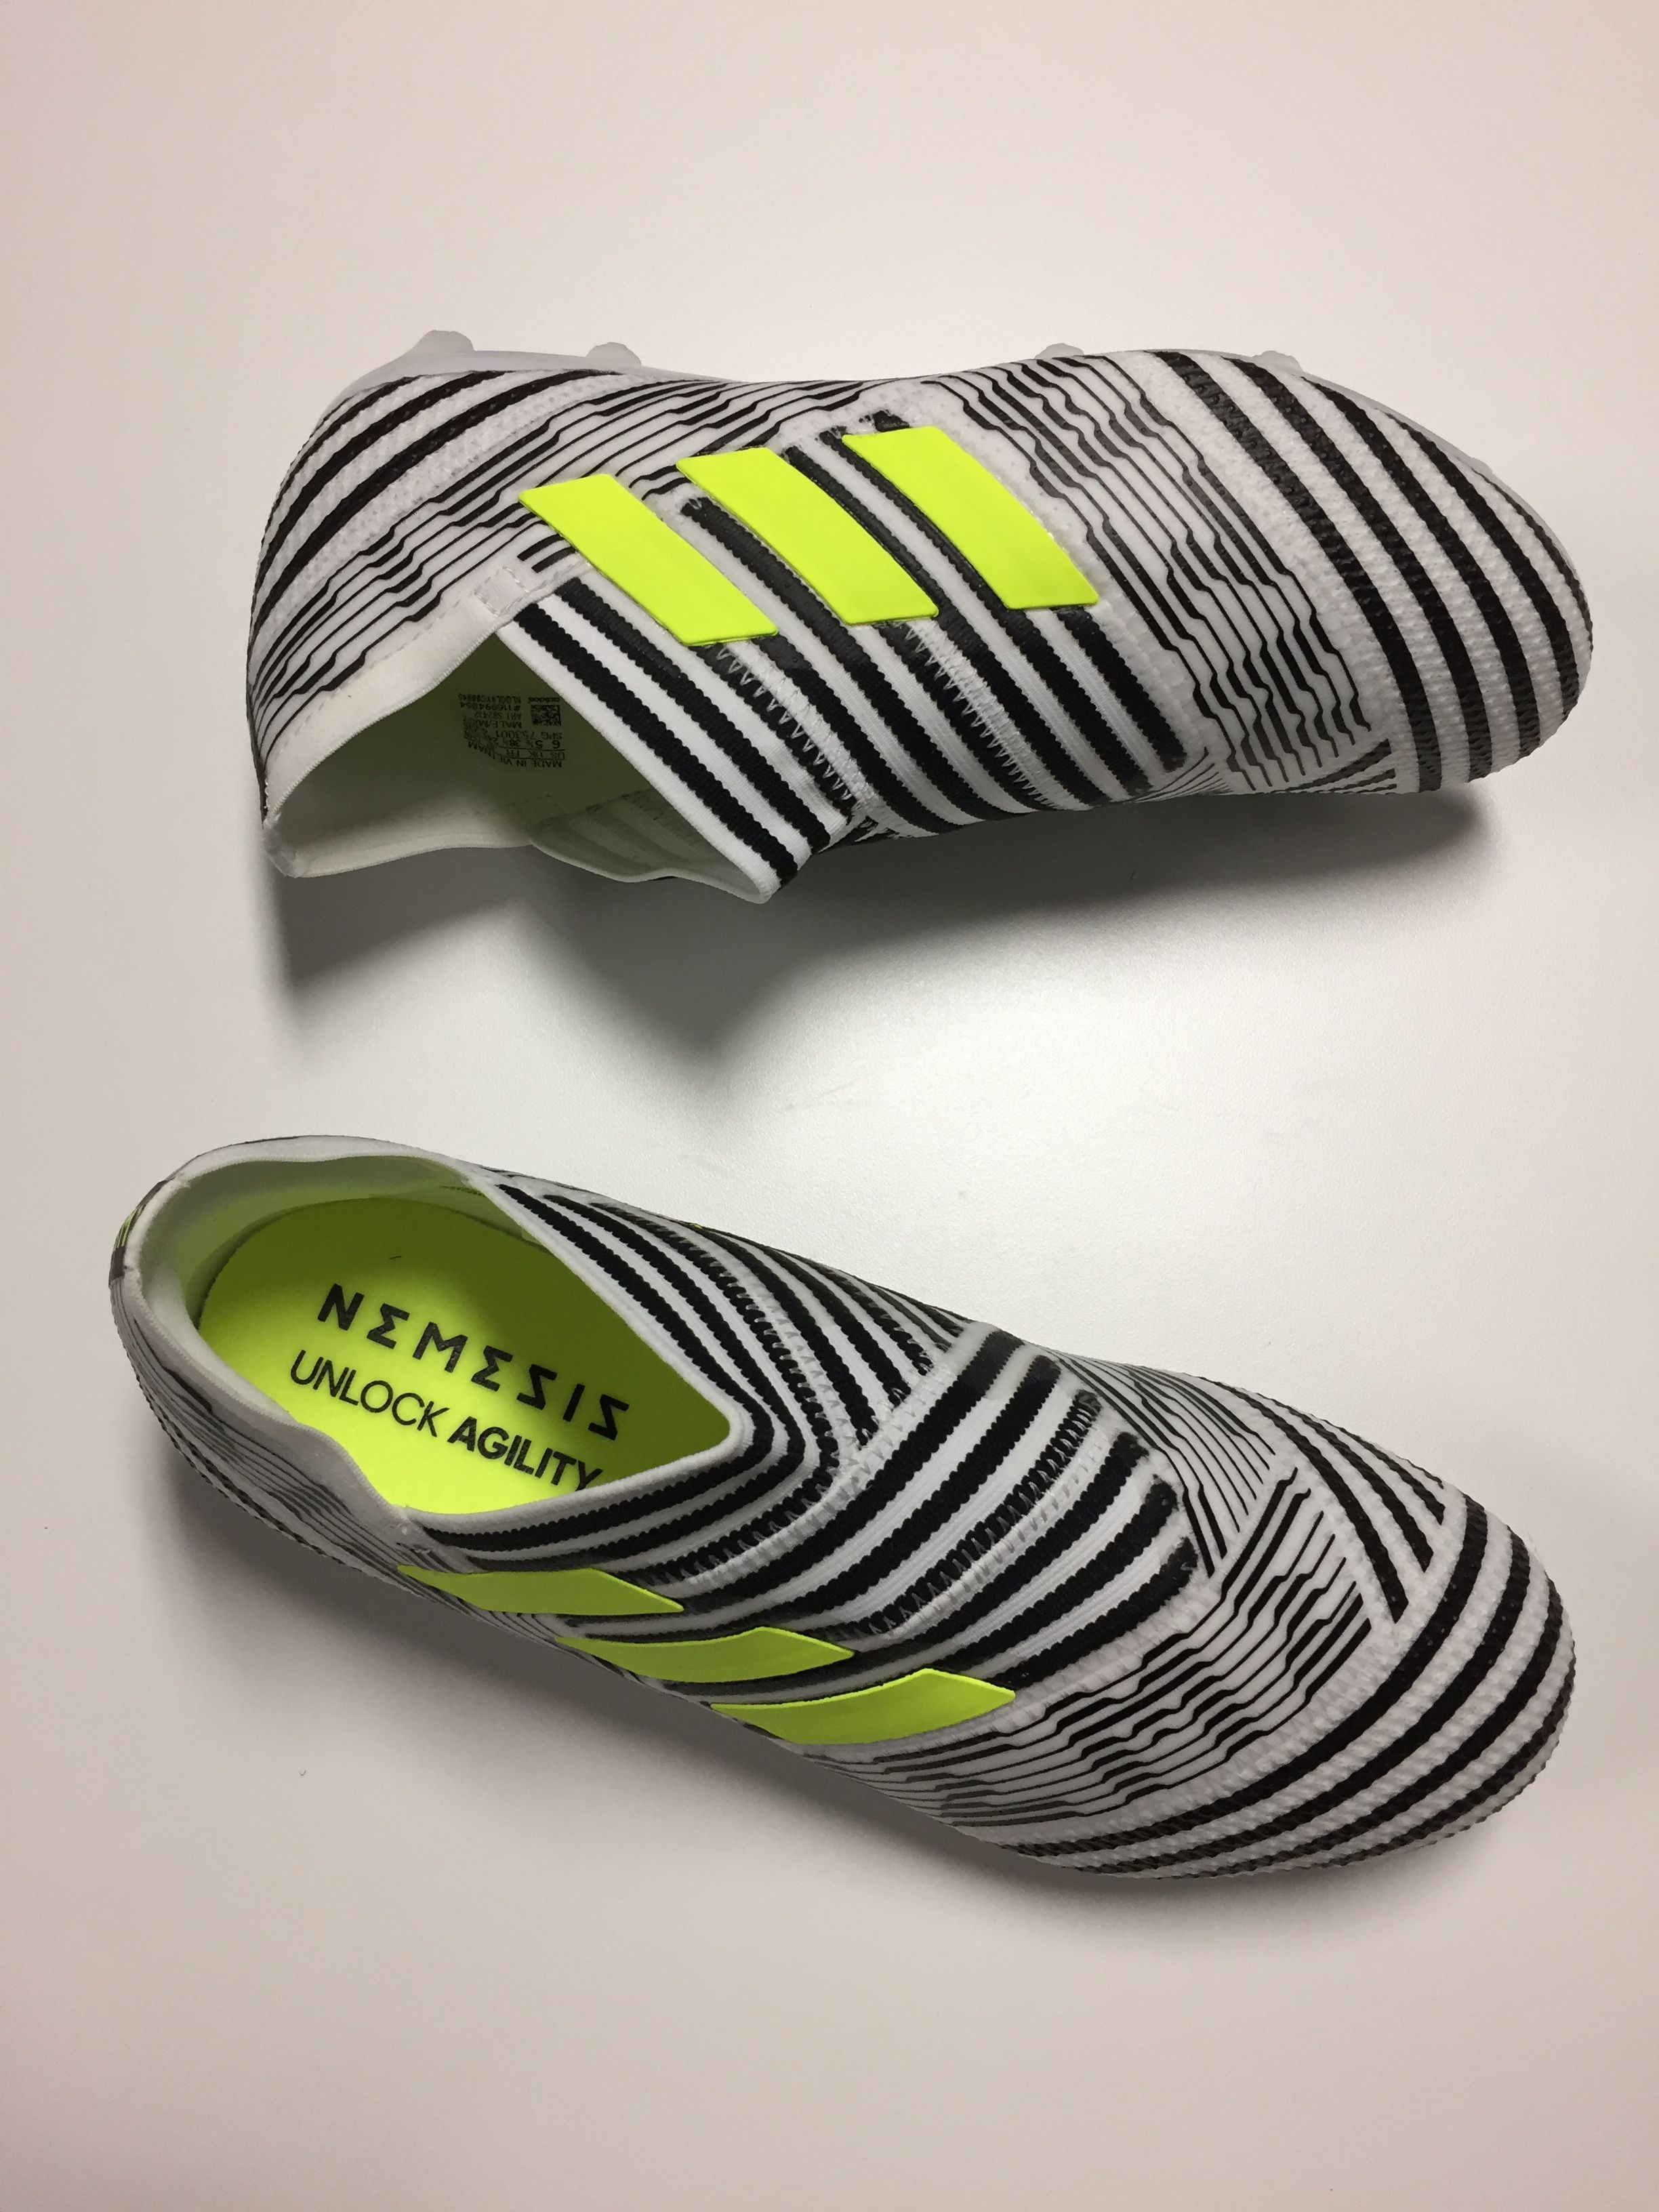 A whole new world. Buy the new adidas Nemeziz 360 Agility shoes here: http://www.soccerpro.com/adidas-Nemeziz/